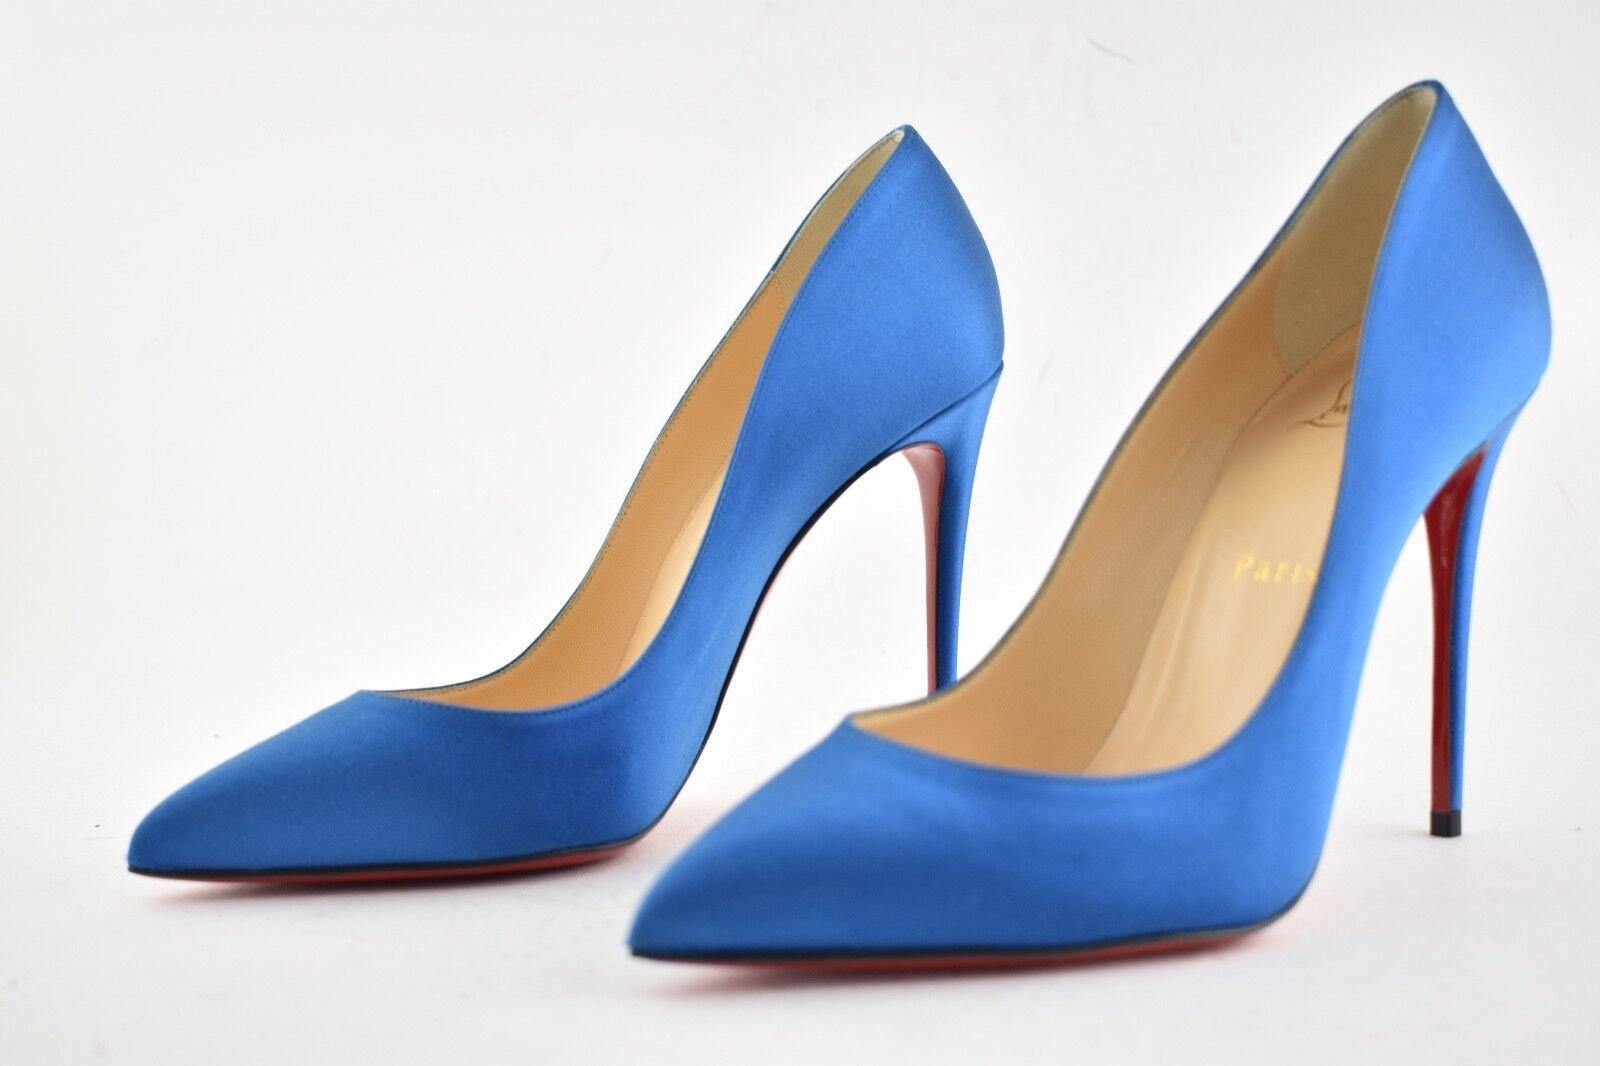 NIB Christian Louboutin Pigalle Follies 100 100 100 bluee Positano Satin Heel Pump 36.5 c1b57e